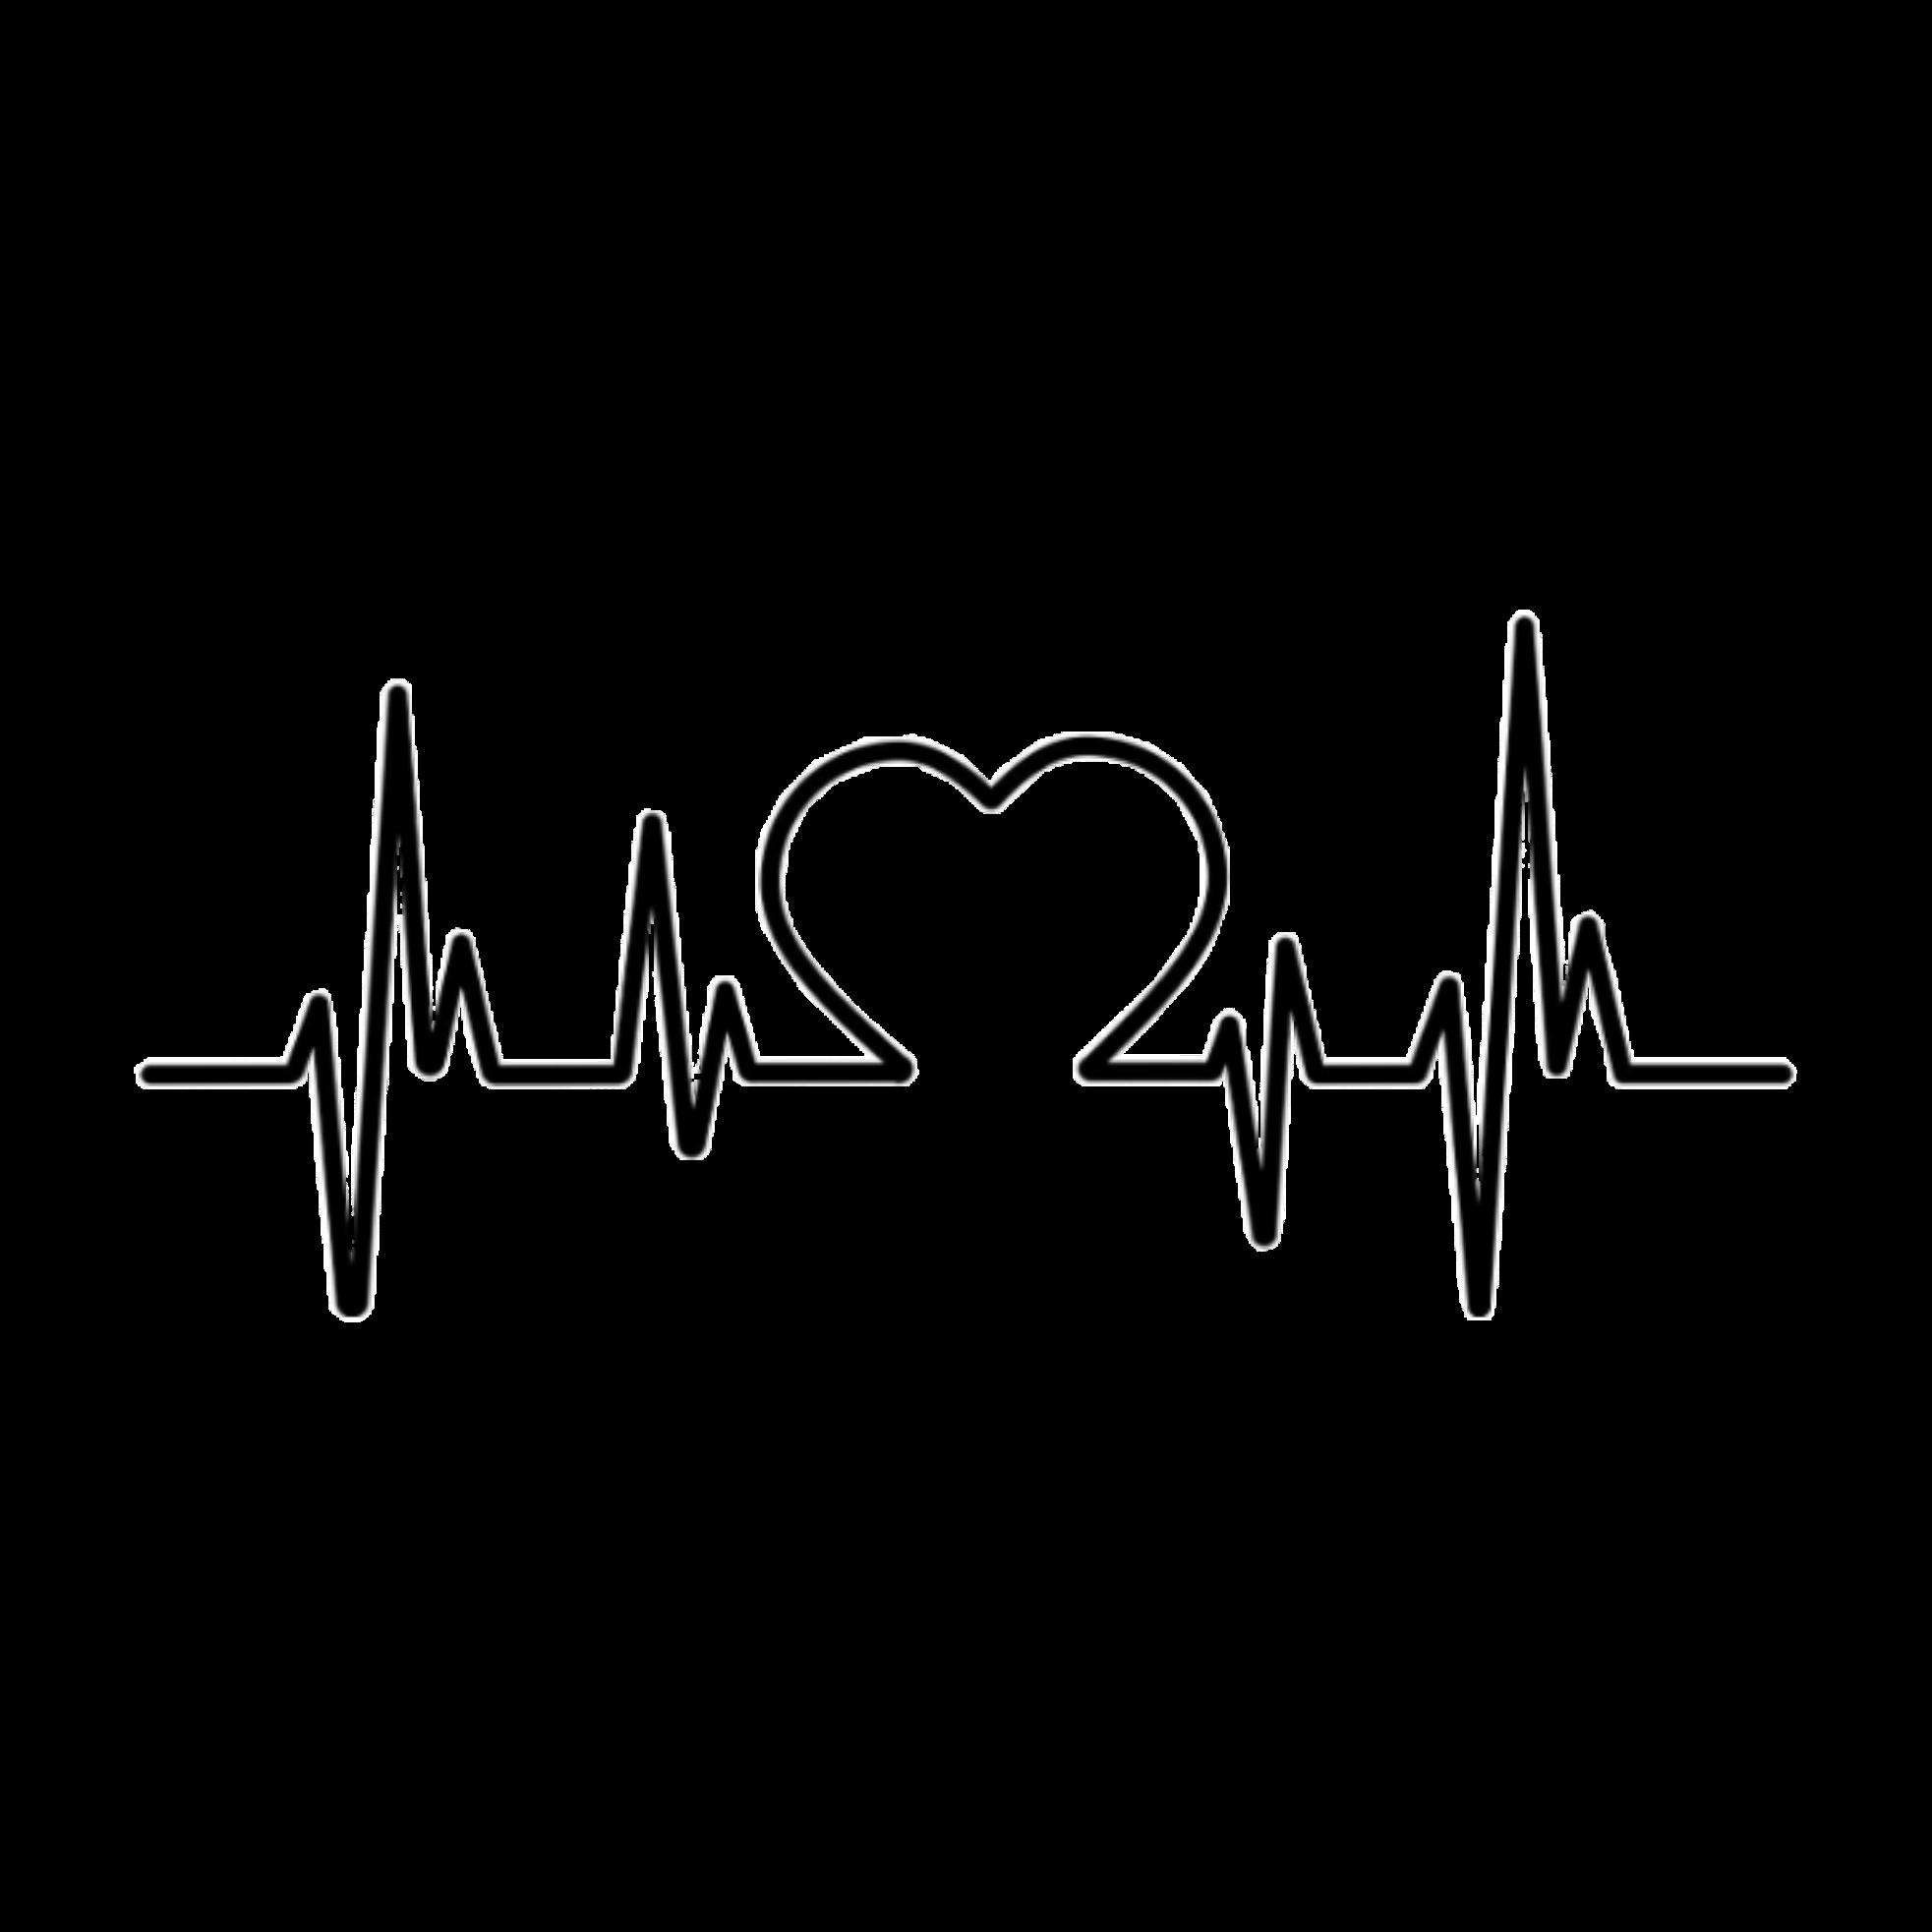 Freetoedit Heartbeat Figure Love Heart Sticker Picsart Remixit Heartbeat Tattoo Heartbeat Tattoo Design Heartbeat Tattoo With Name